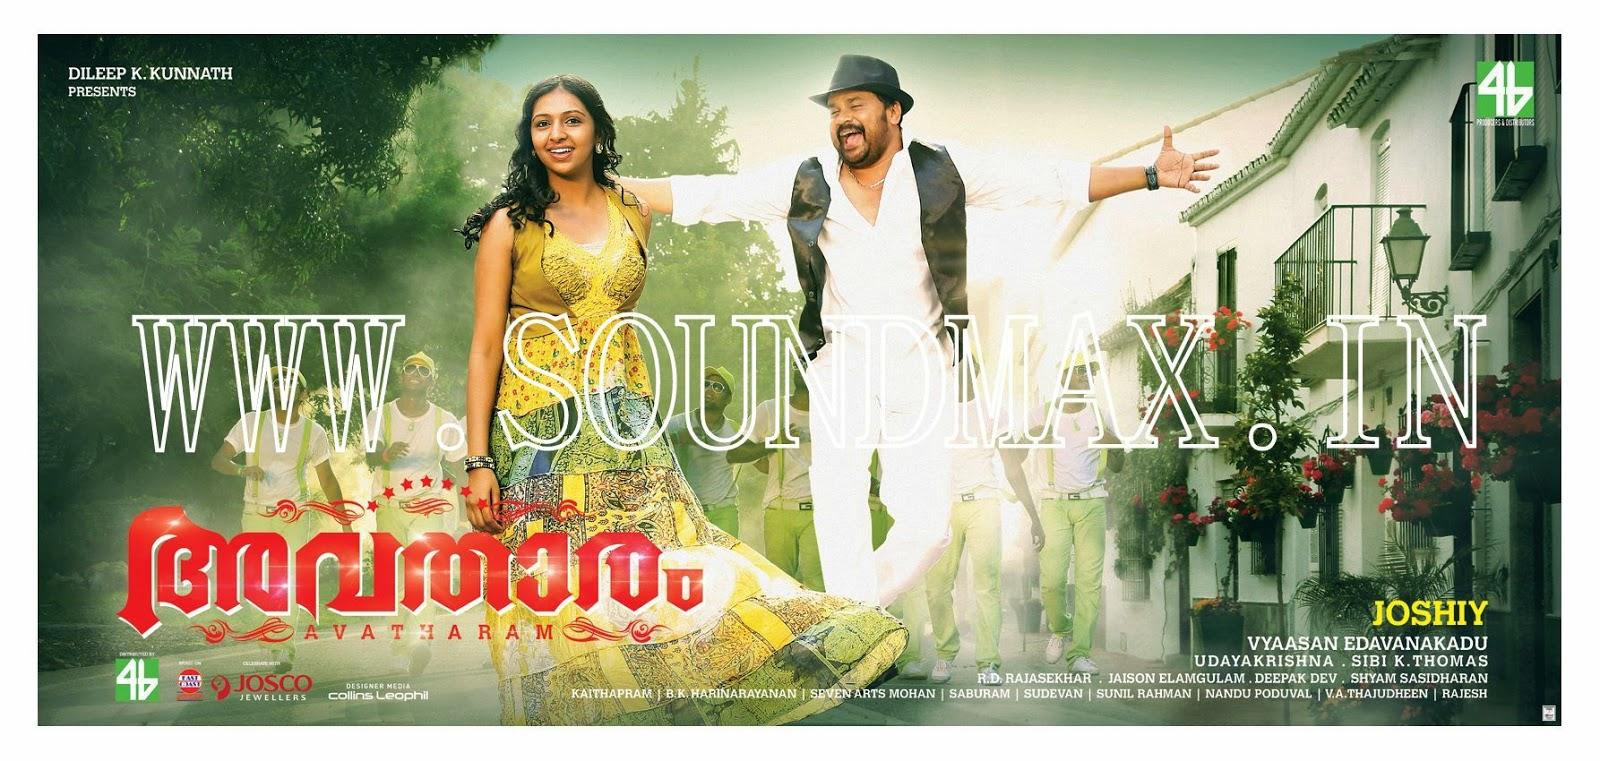 Avatharam-Malayalam-Movie-Mp3-Songs-Download